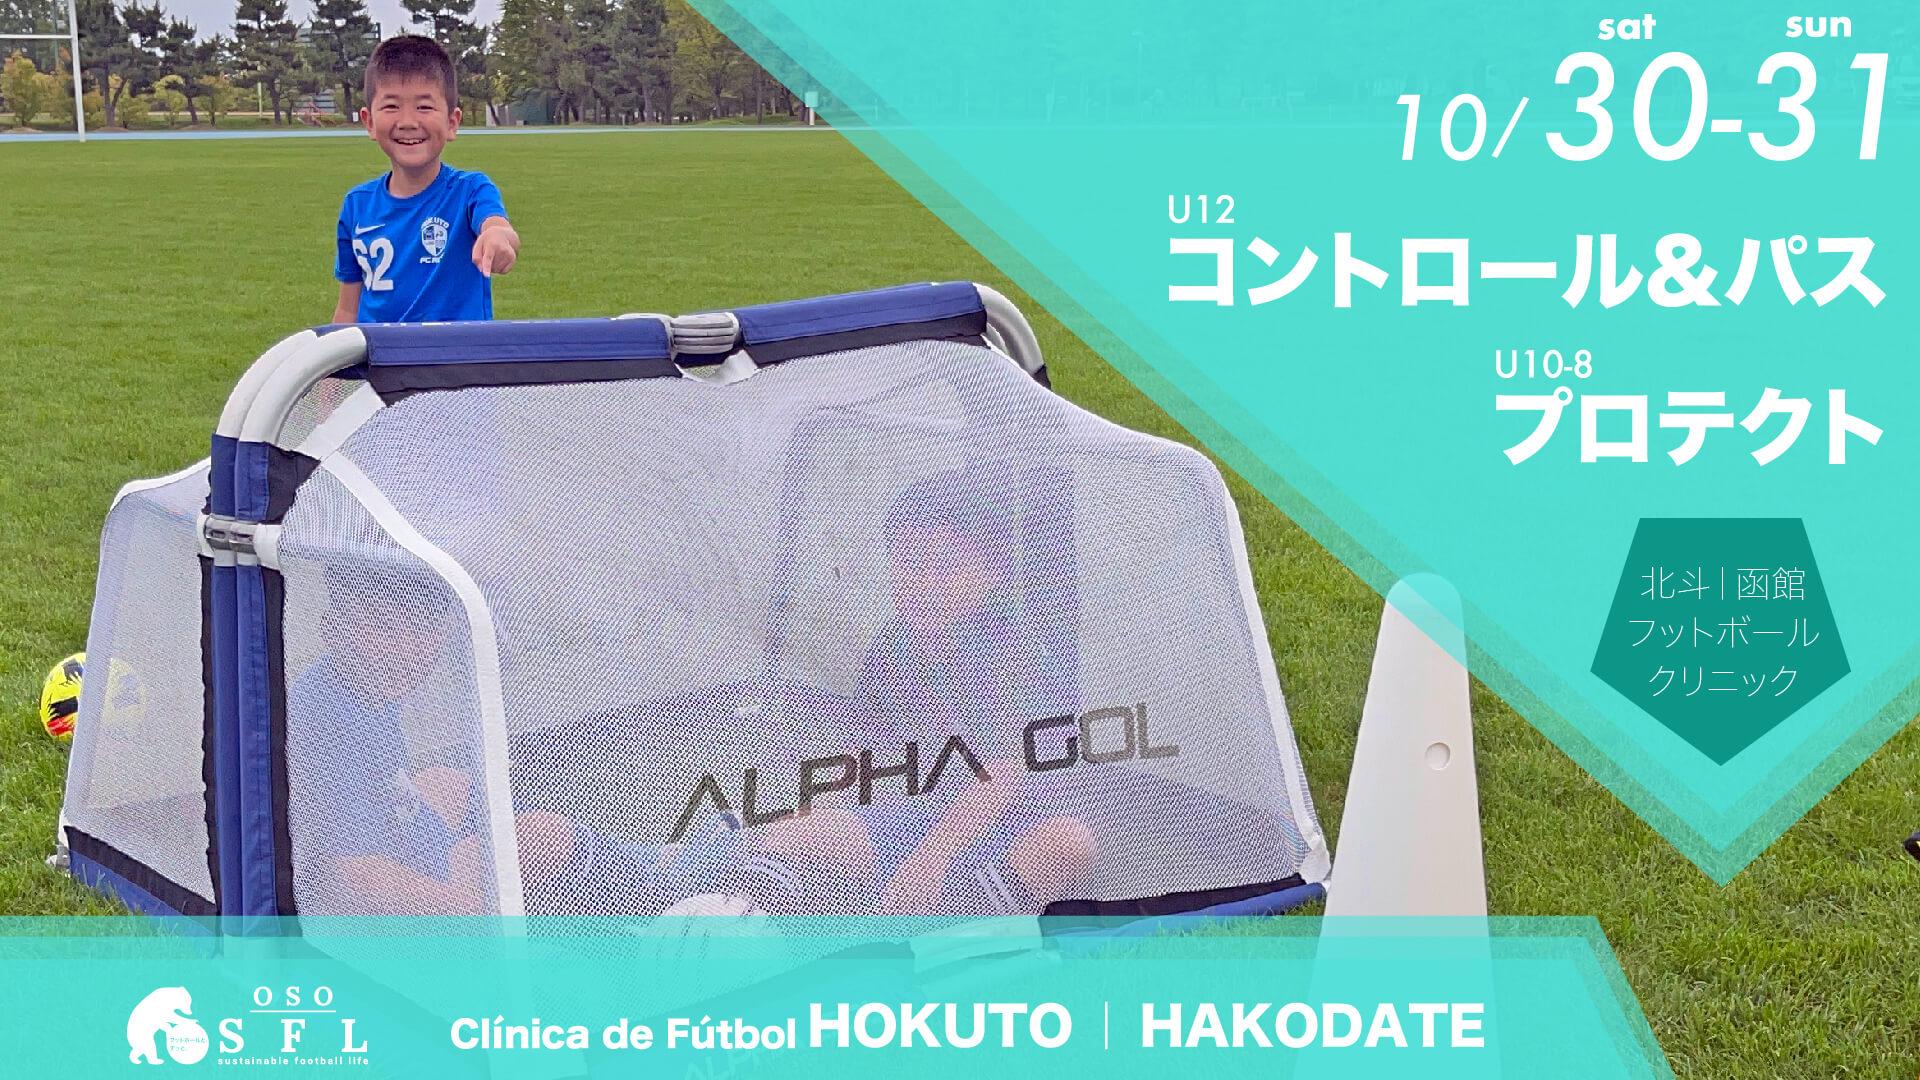 leaflet-hokuto-hakodate-clinic-21130-31_1920px